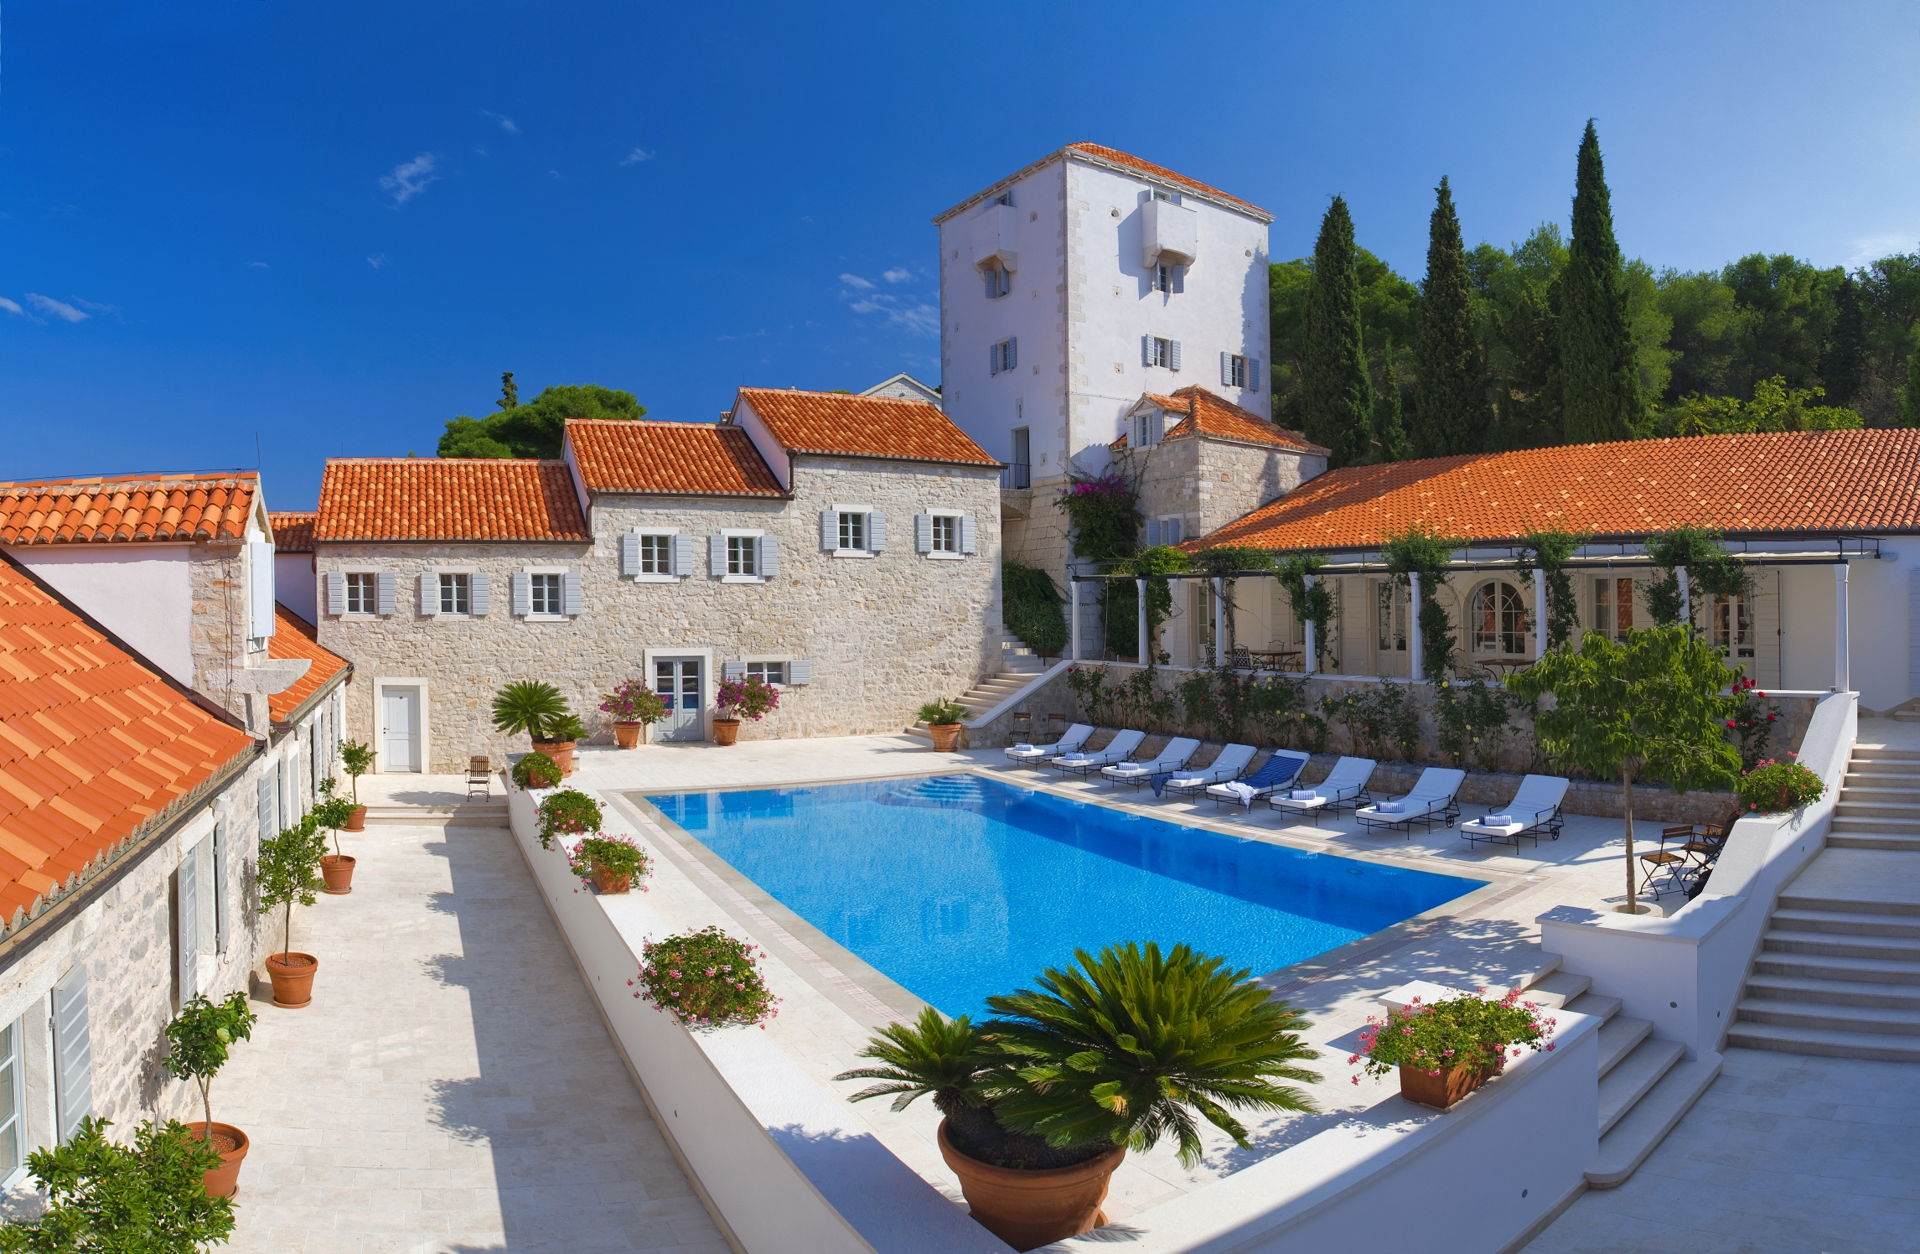 Villas in Croatia for Events